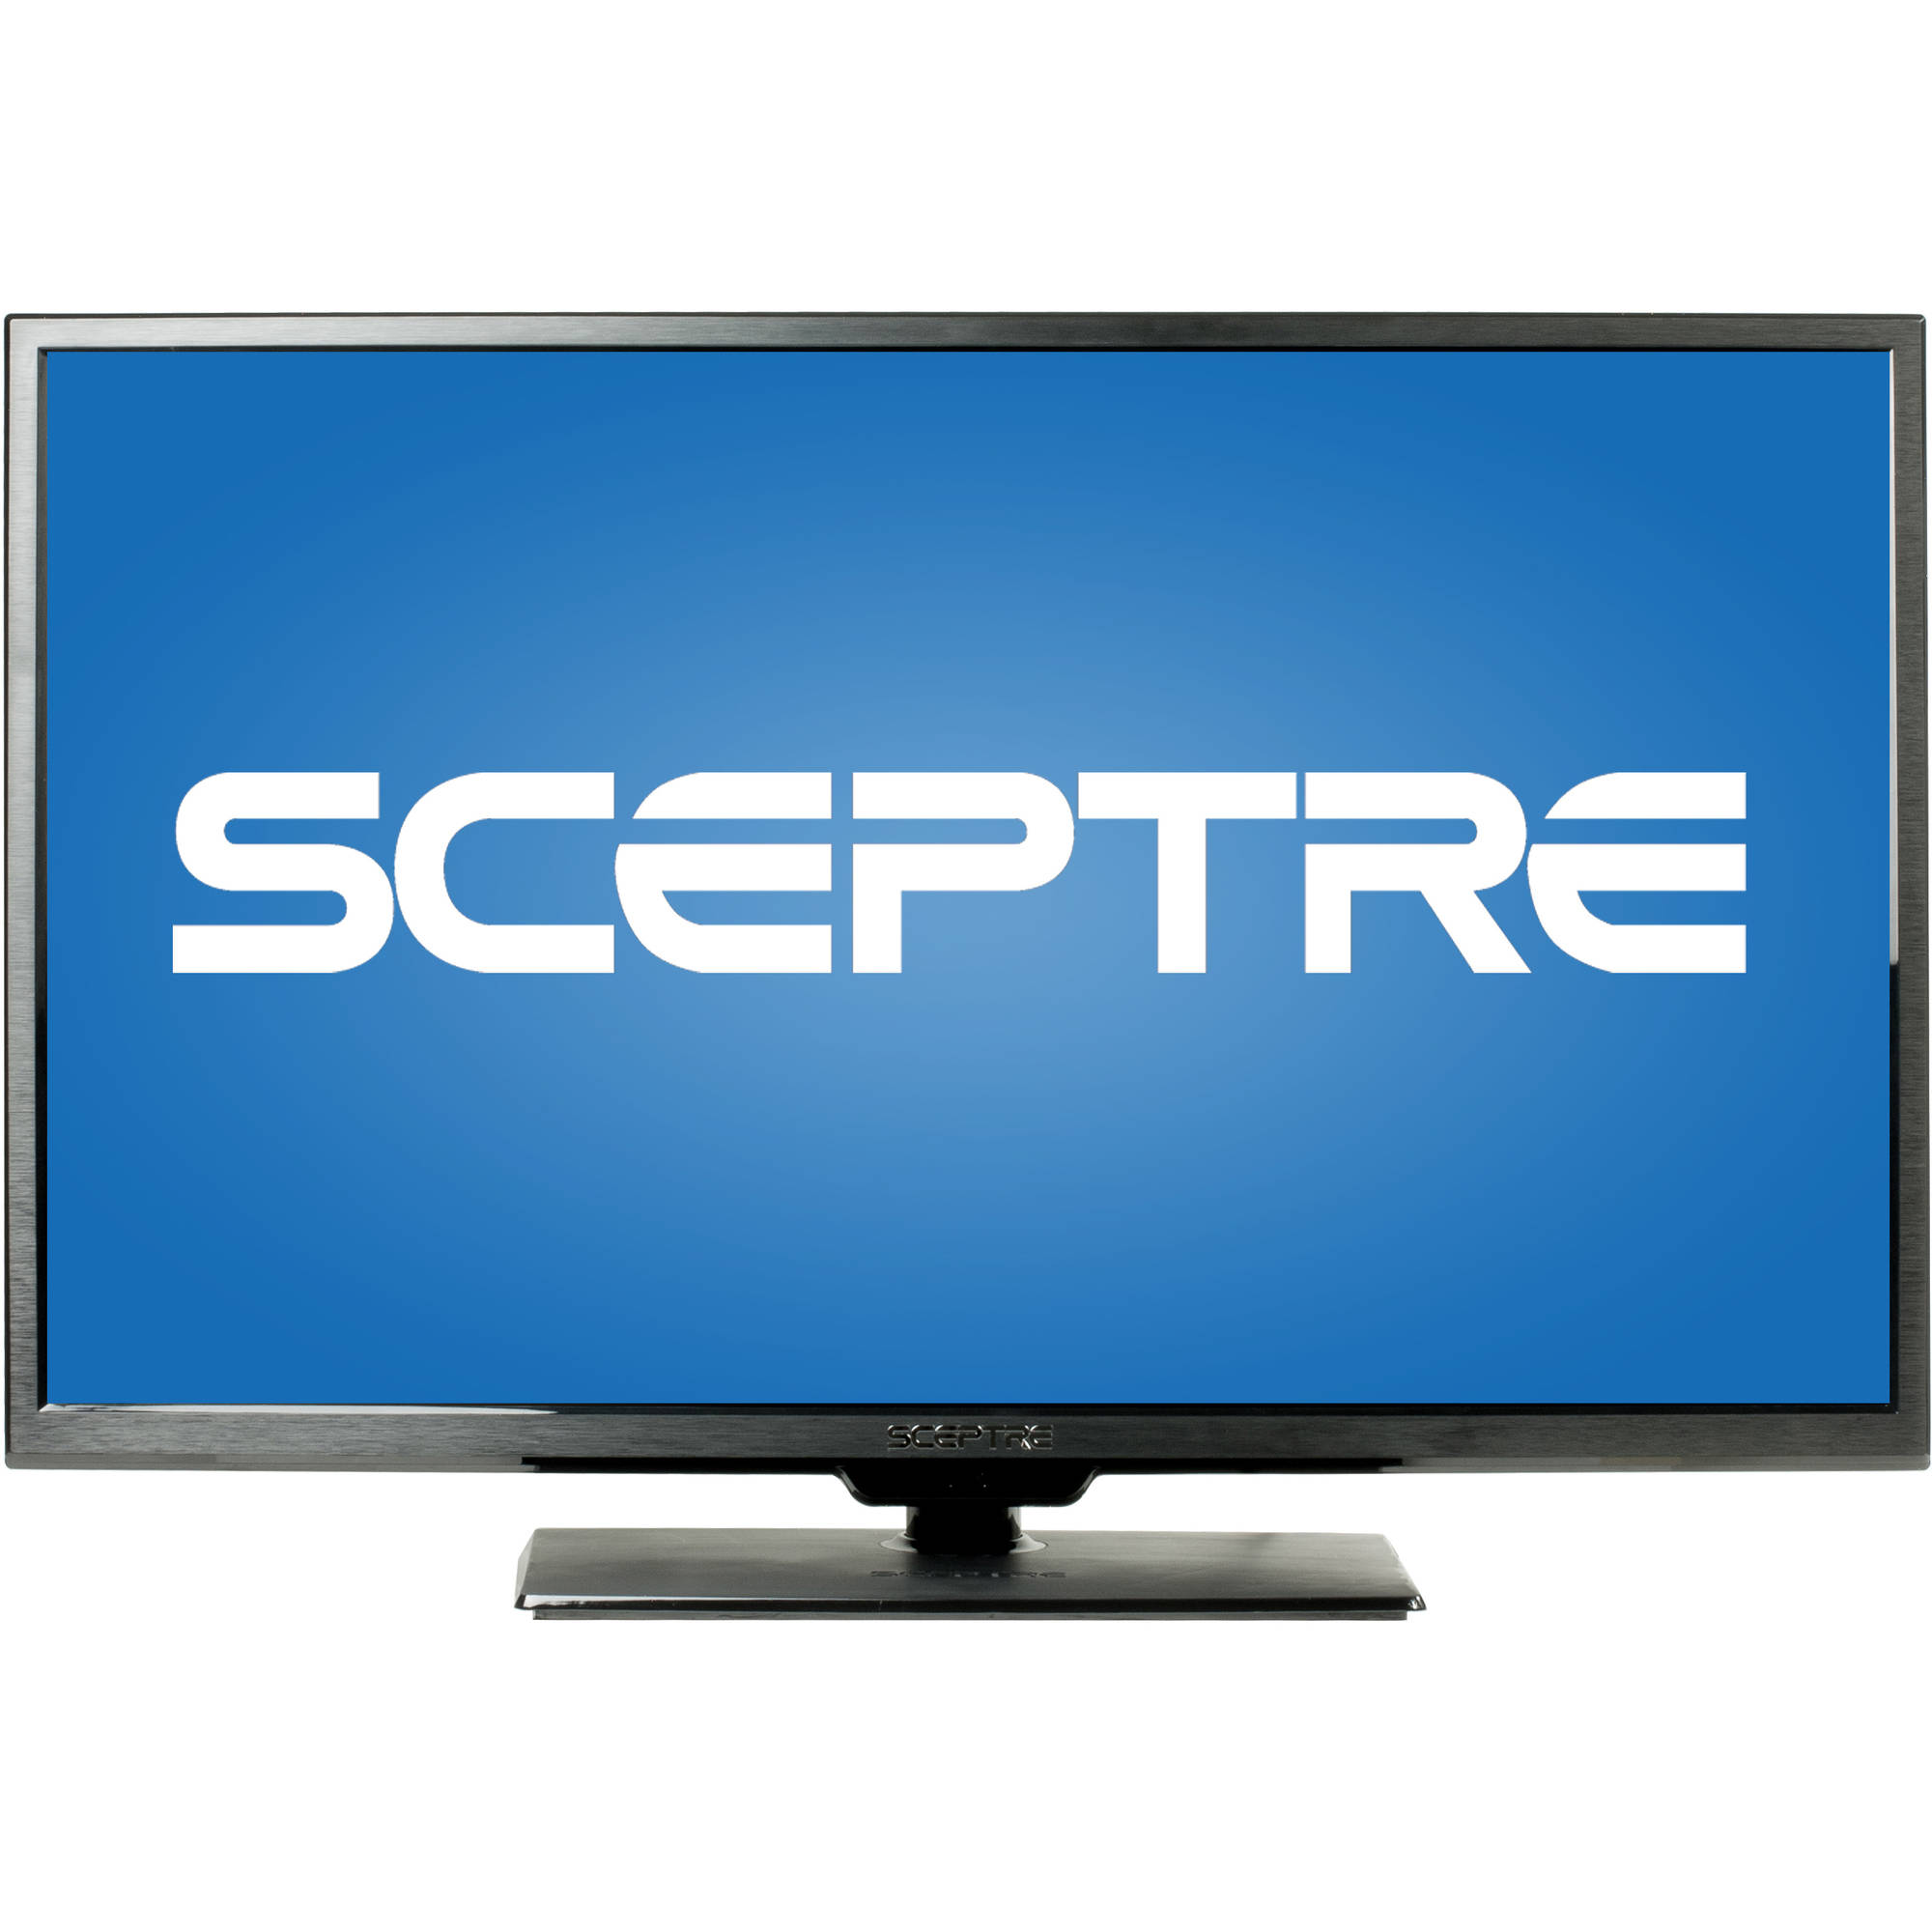 "SCEPTRE X405BV-F 40"" LED Class 1080P HDTV with ultra slim metal brush bezel, 60Hz"